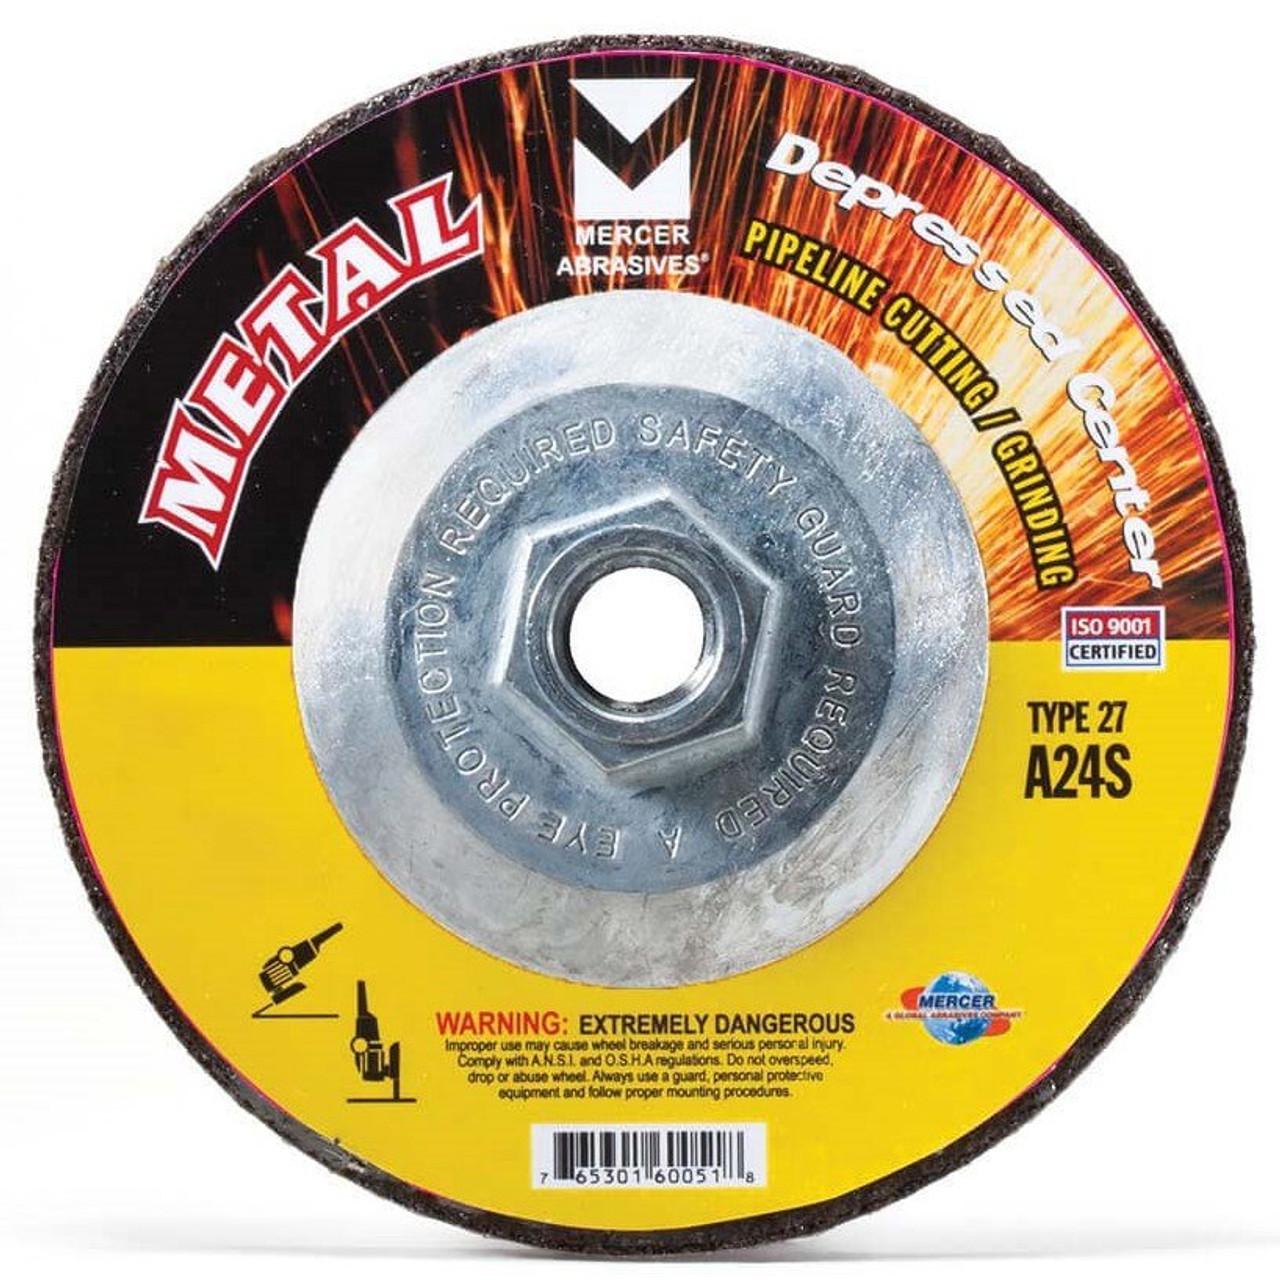 RPM 7//8 Arbor 4-1//2 Type 27 Zirconia Alumina Depressed Center Wheels pack of 5 13,300 Max 1//8-Thick